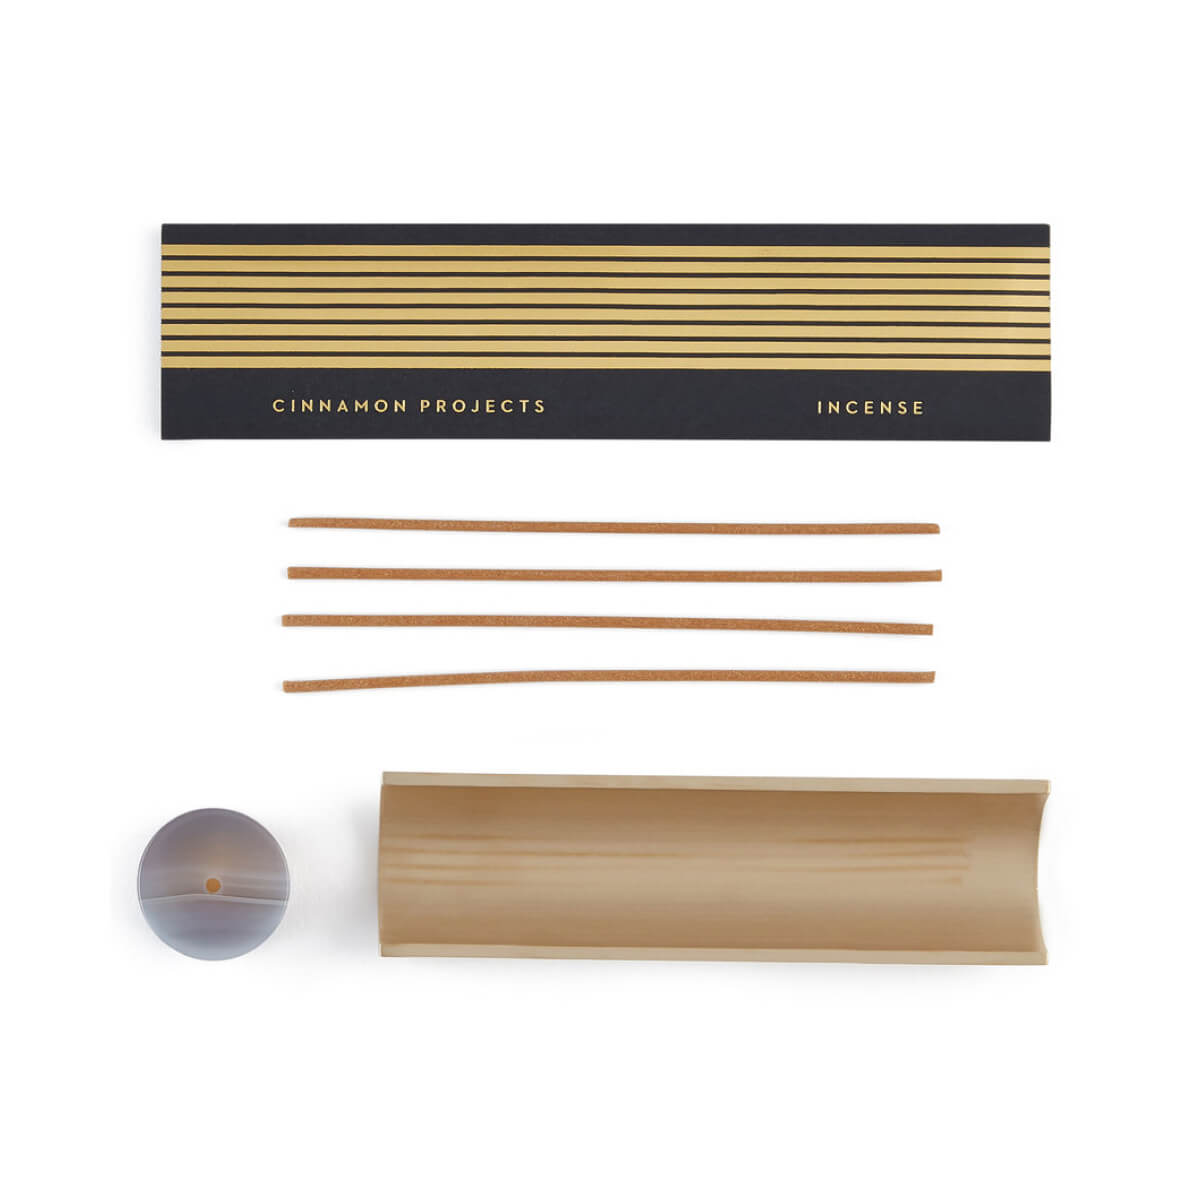 goop x Cinnamon Projects goop Exclusive Agate Burner + Incense Set